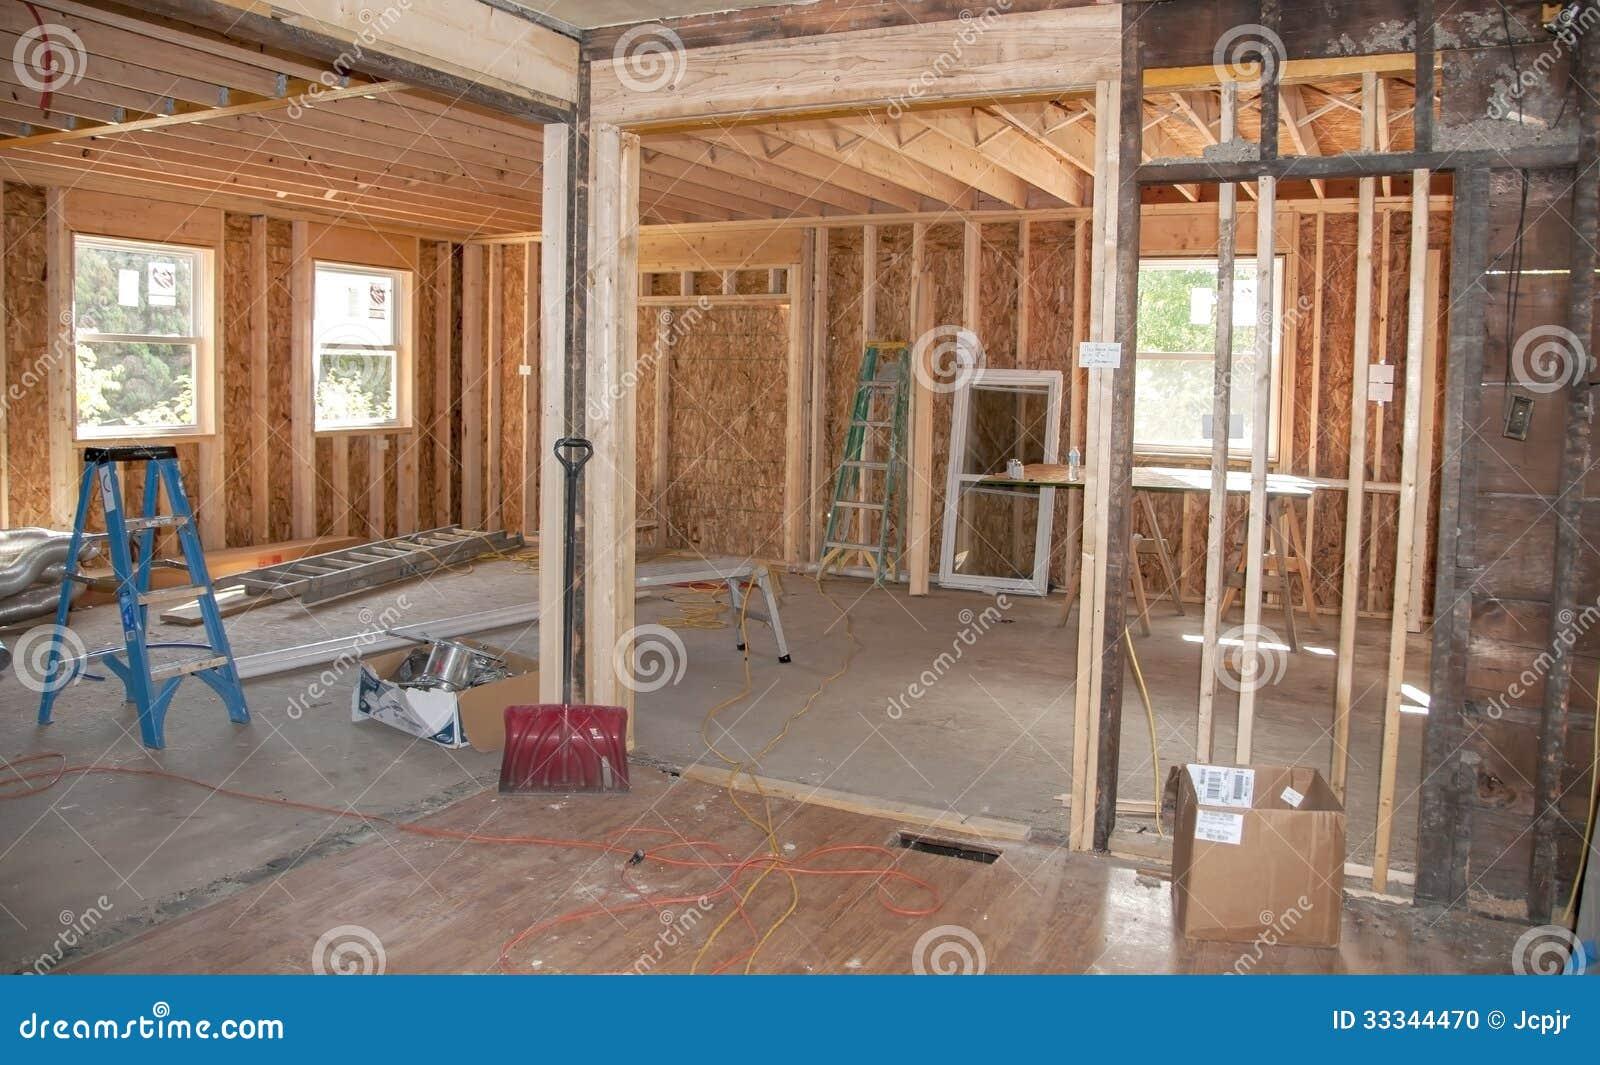 Room Addition